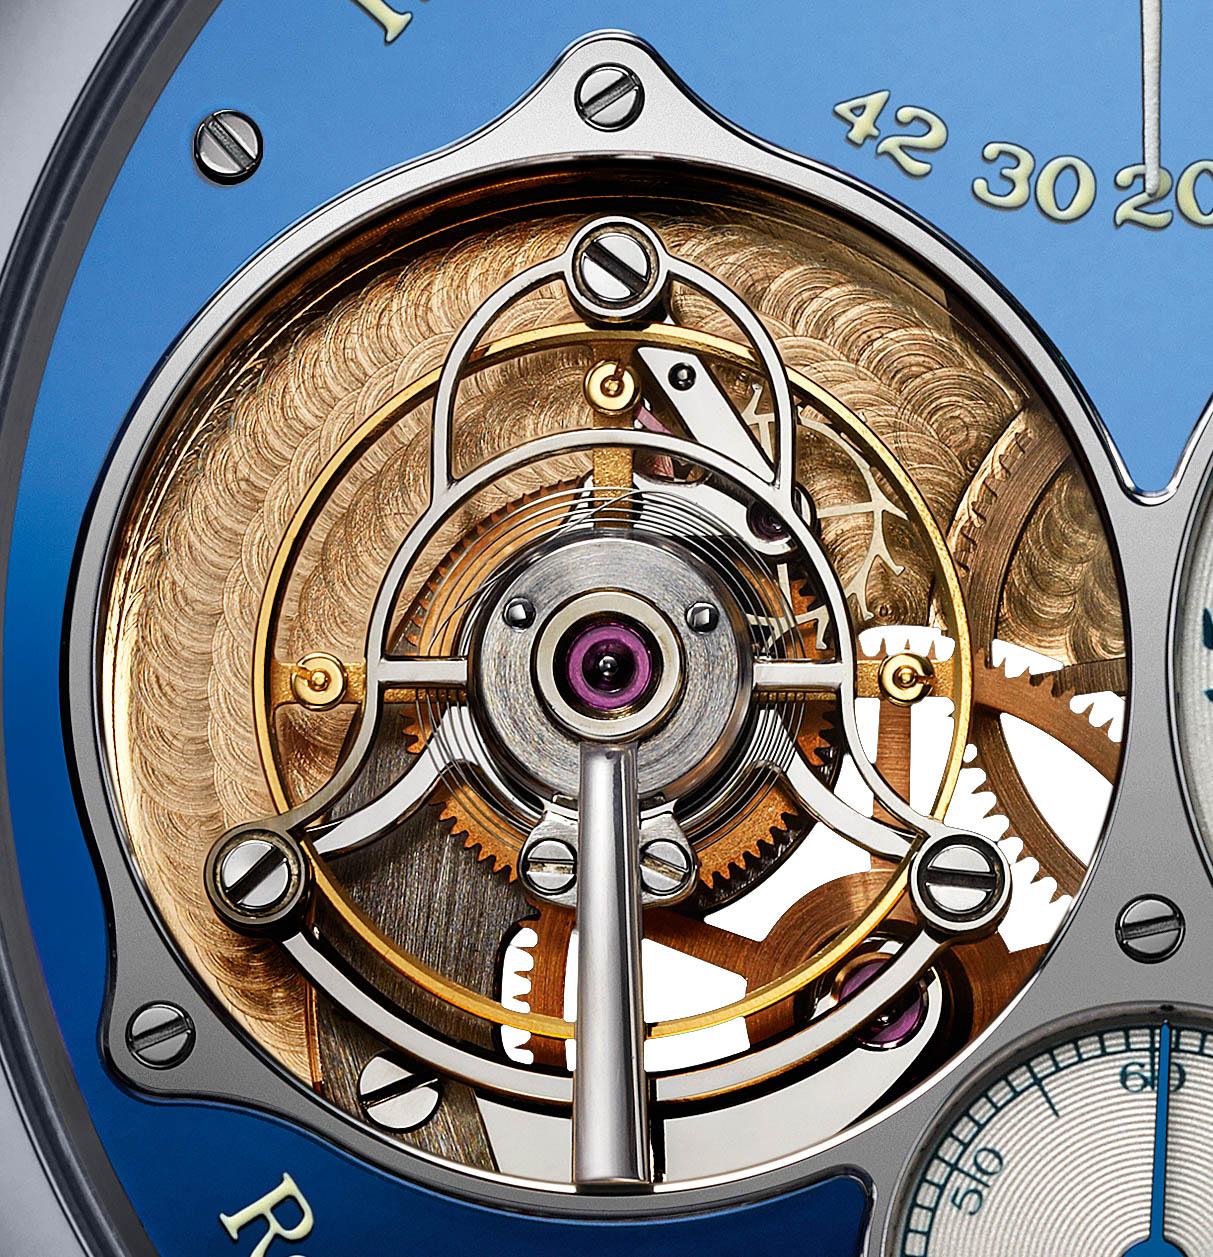 f-p-journe-tourbillon-souverain-bleu-2